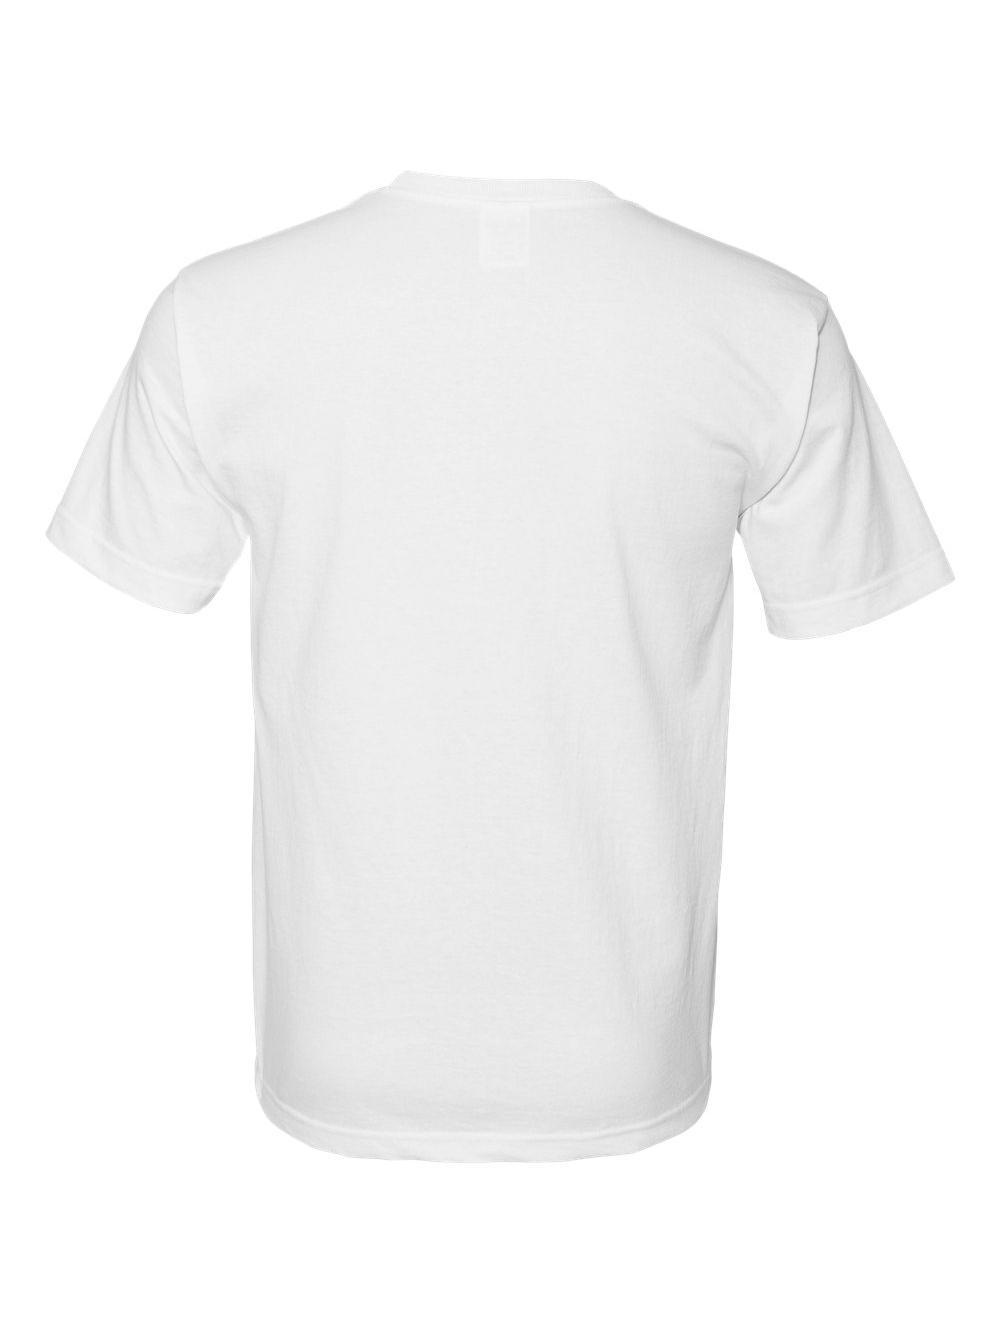 Bayside-USA-Made-100-Cotton-Short-Sleeve-T-Shirt-5040 thumbnail 34